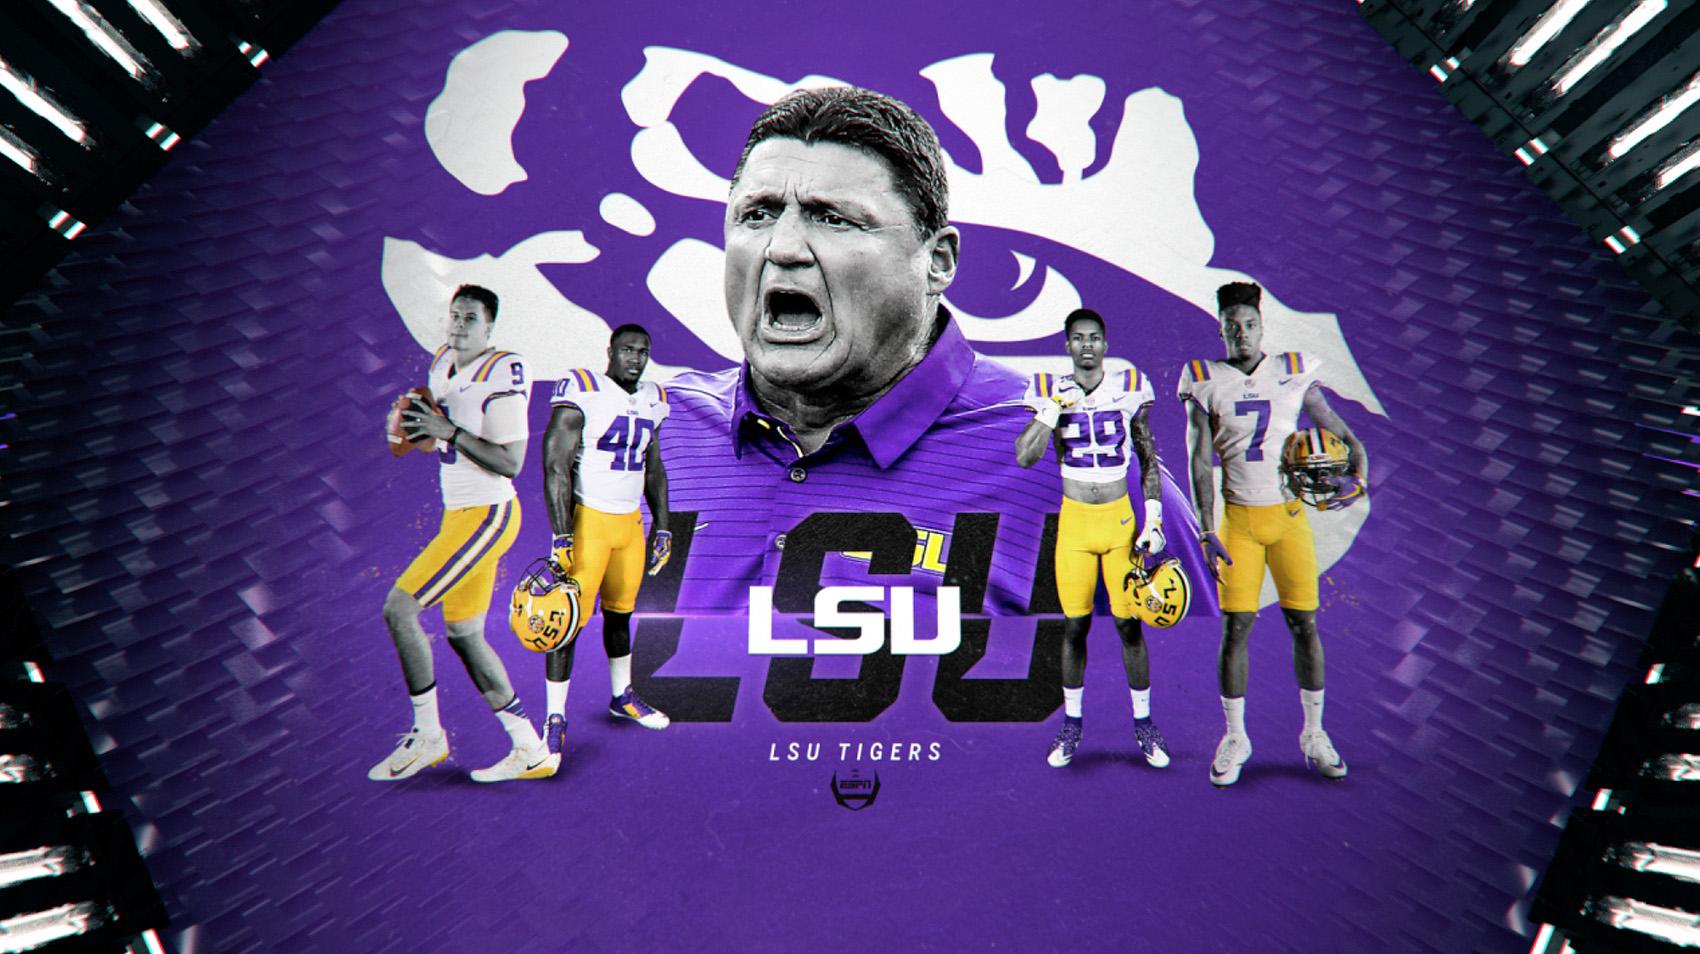 NCS_ESPN-College-Football-Broadcast-Design_0028